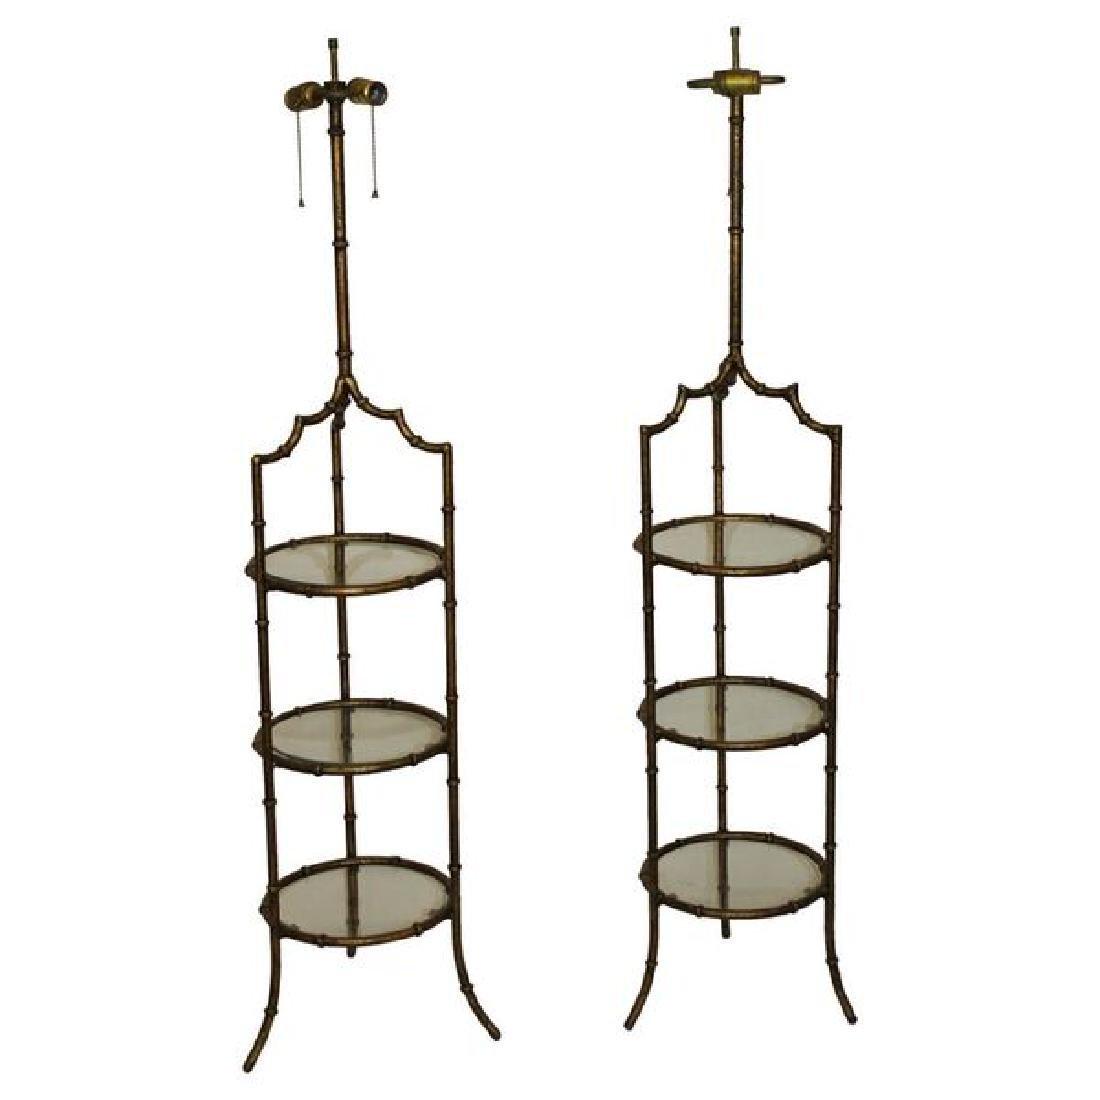 Mid Century Hollywood Regency Floor Lamps - 4